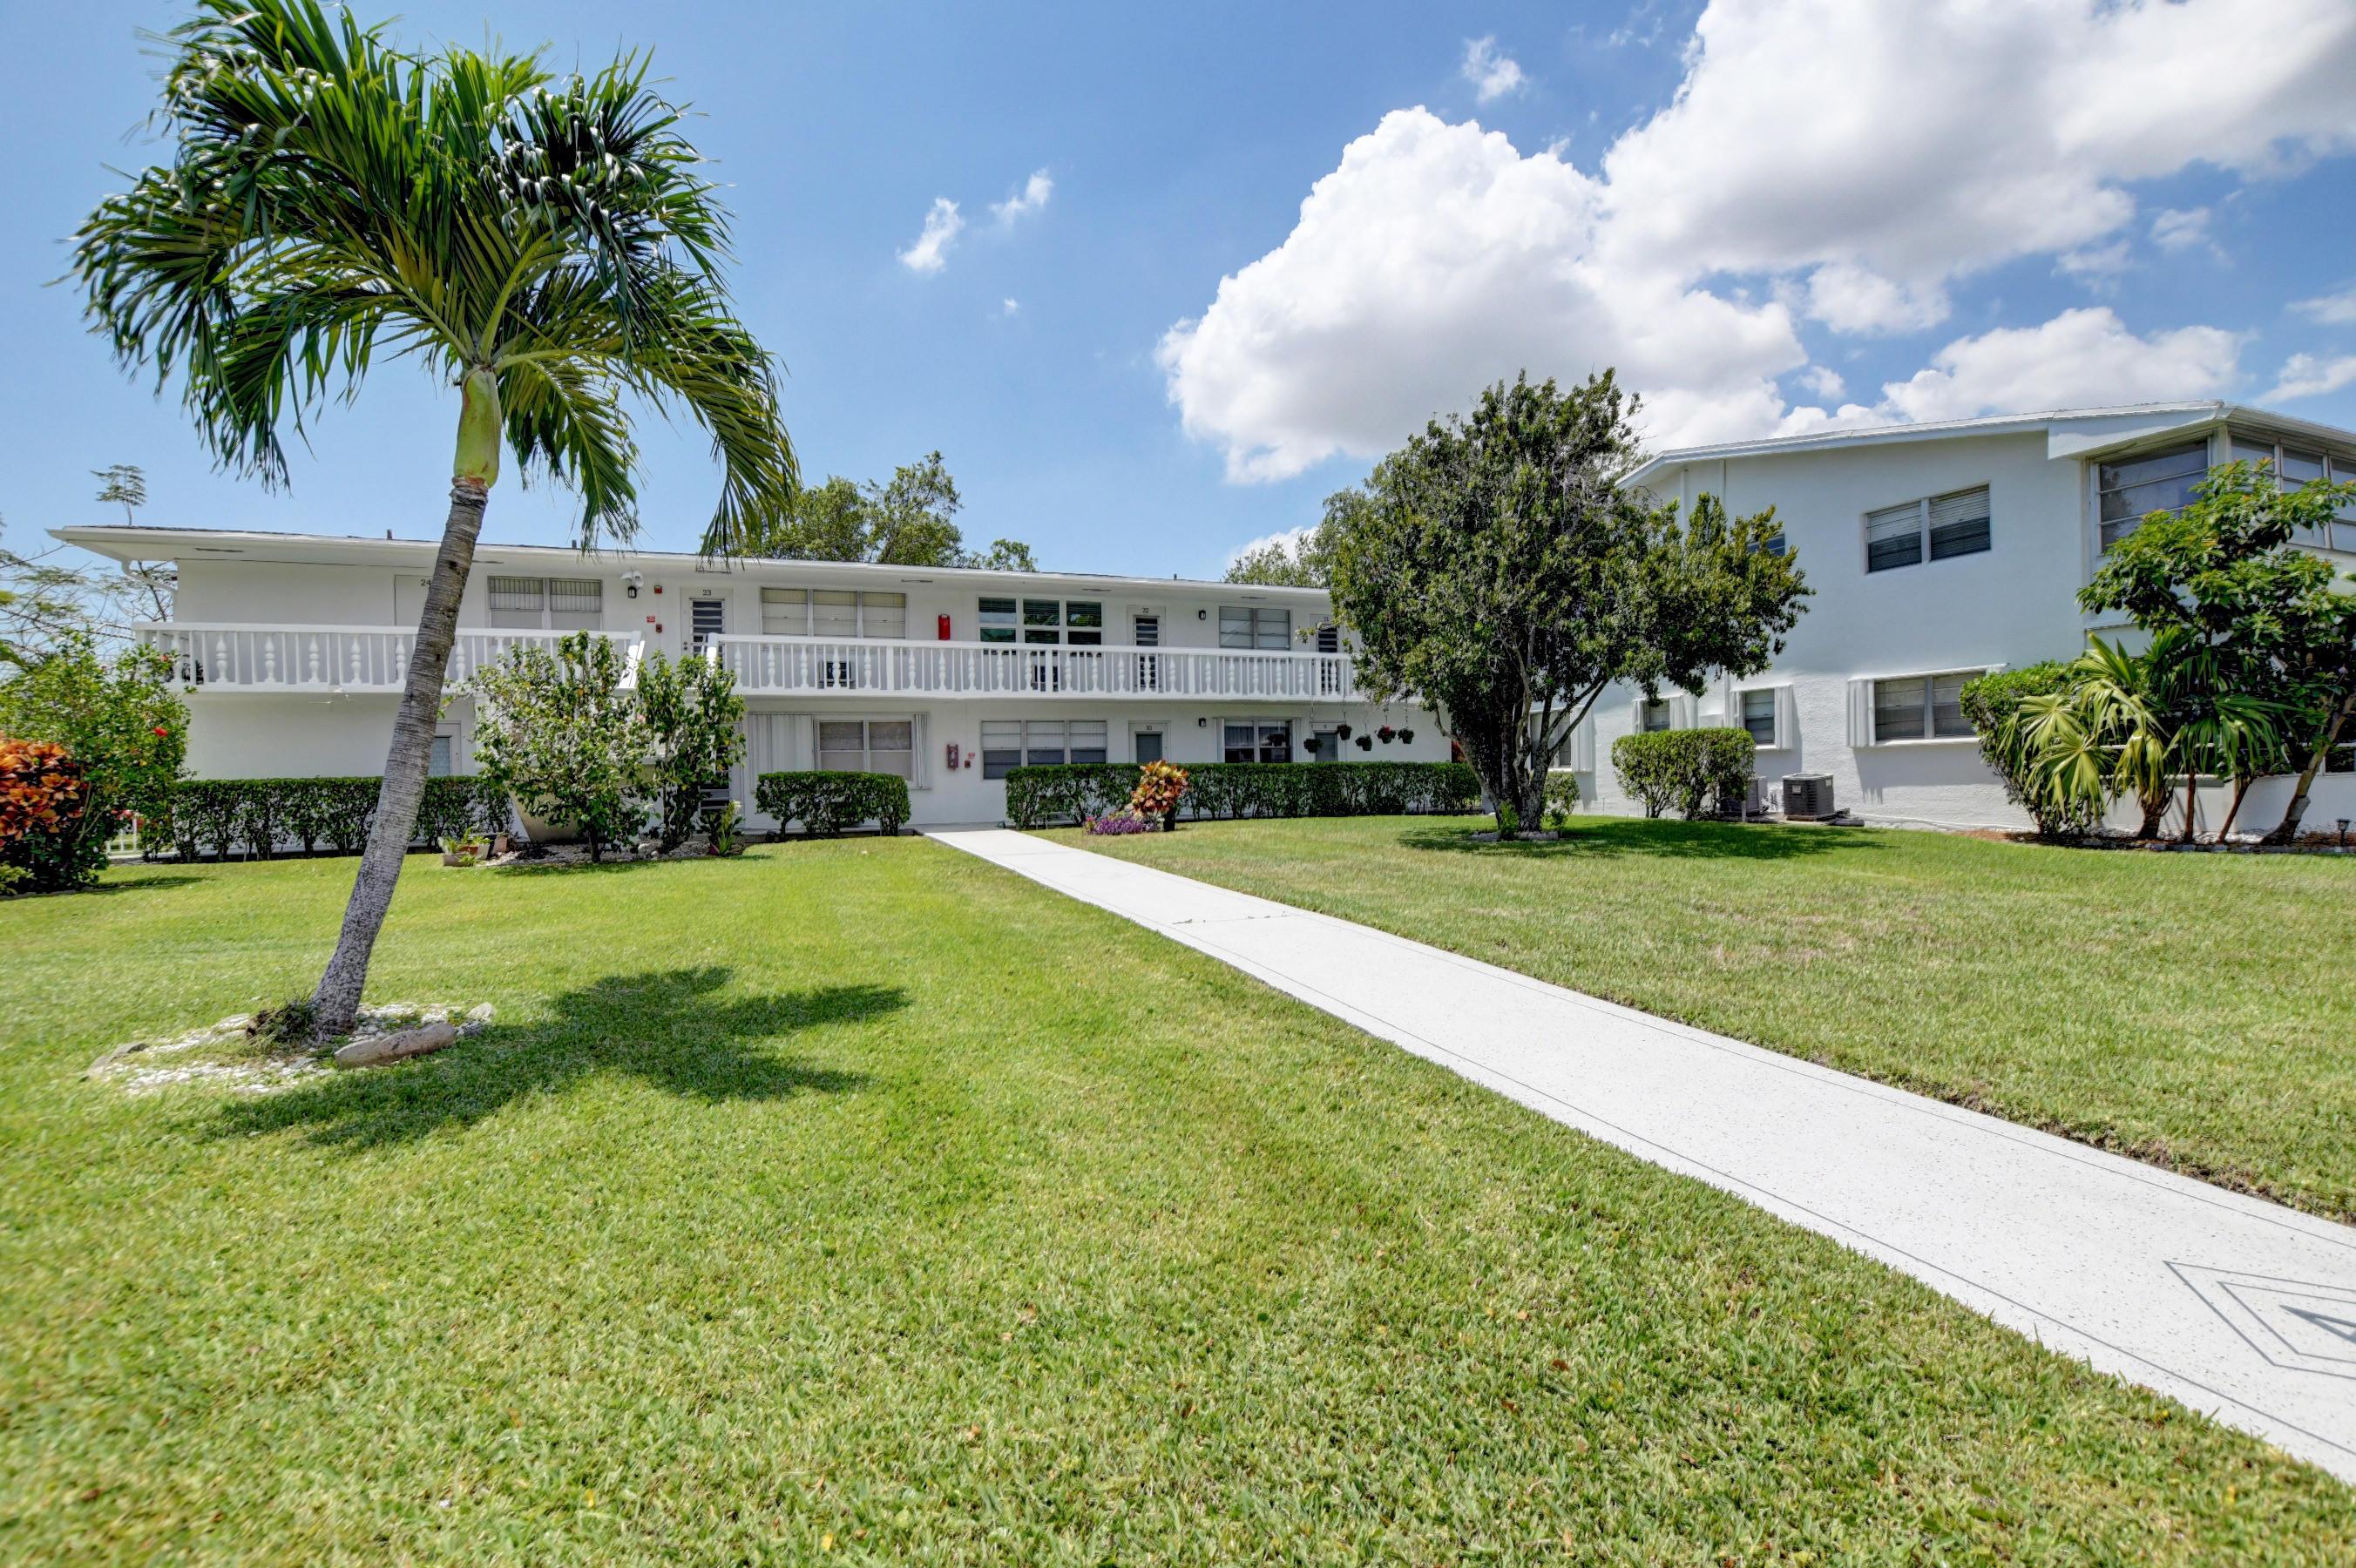 7 Farnham A 7  Deerfield Beach FL 33442